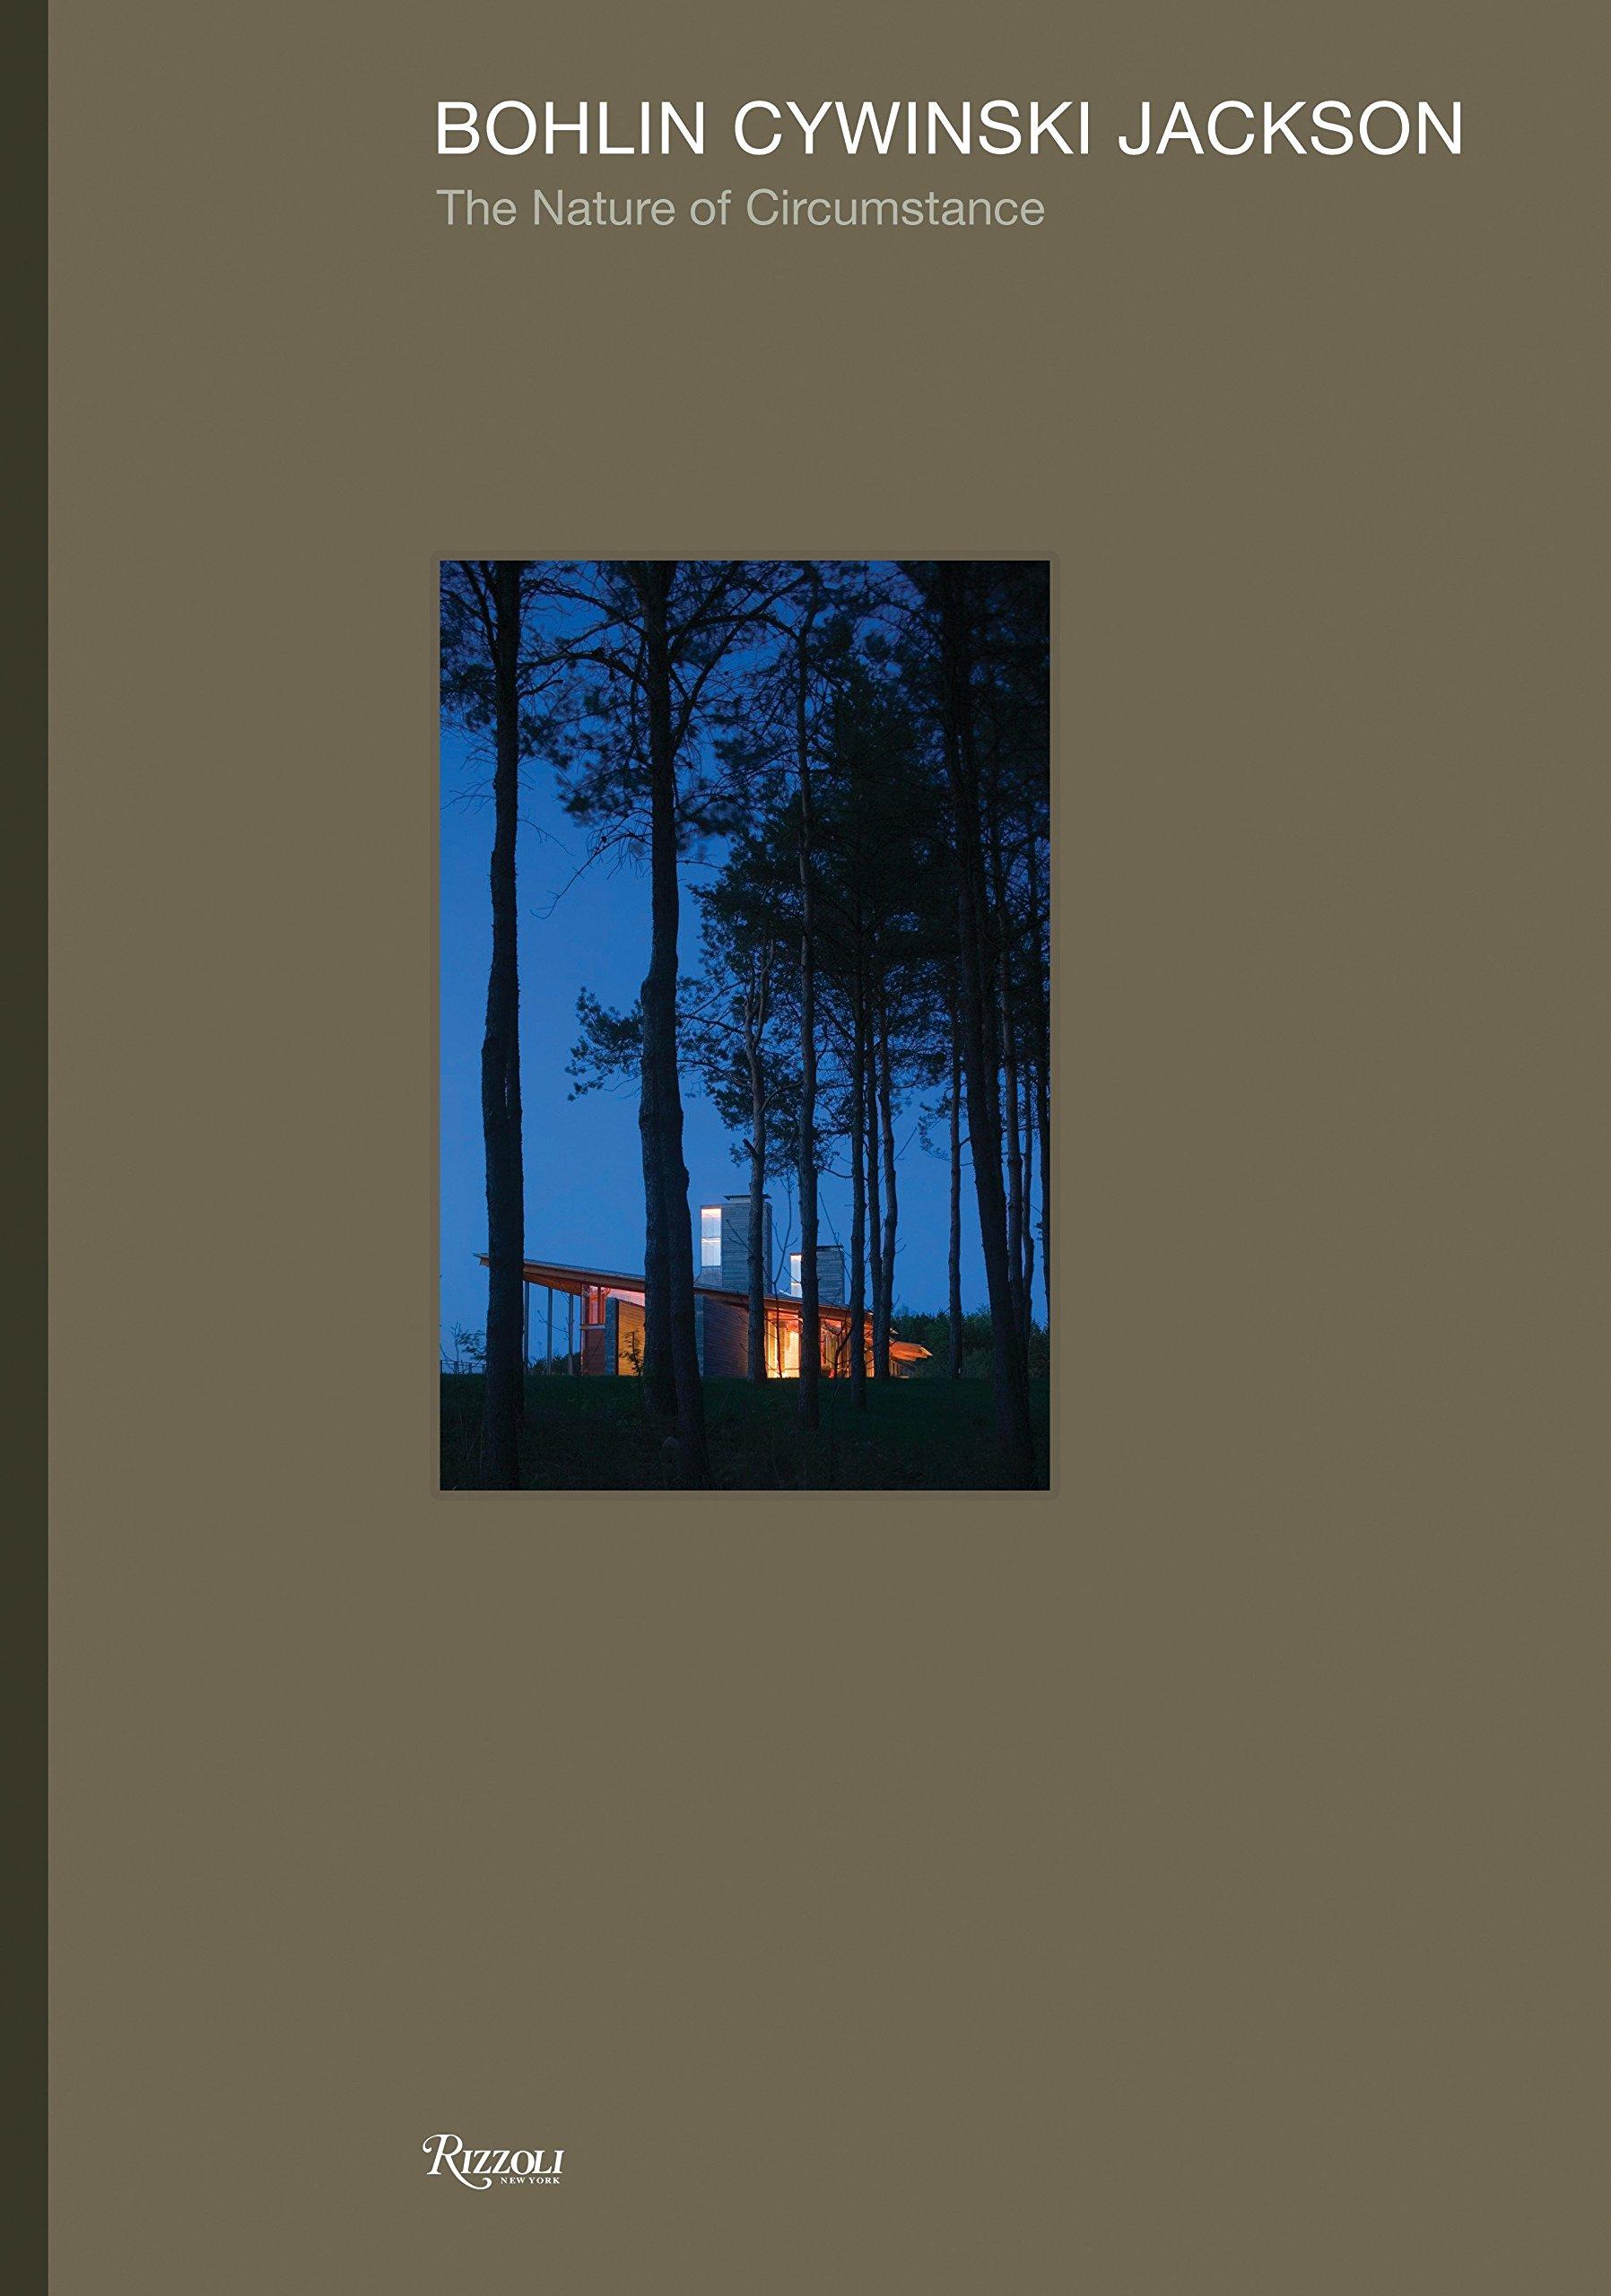 Bohlin Cywinski Jackson: The Nature of Circumstance by Rizzoli